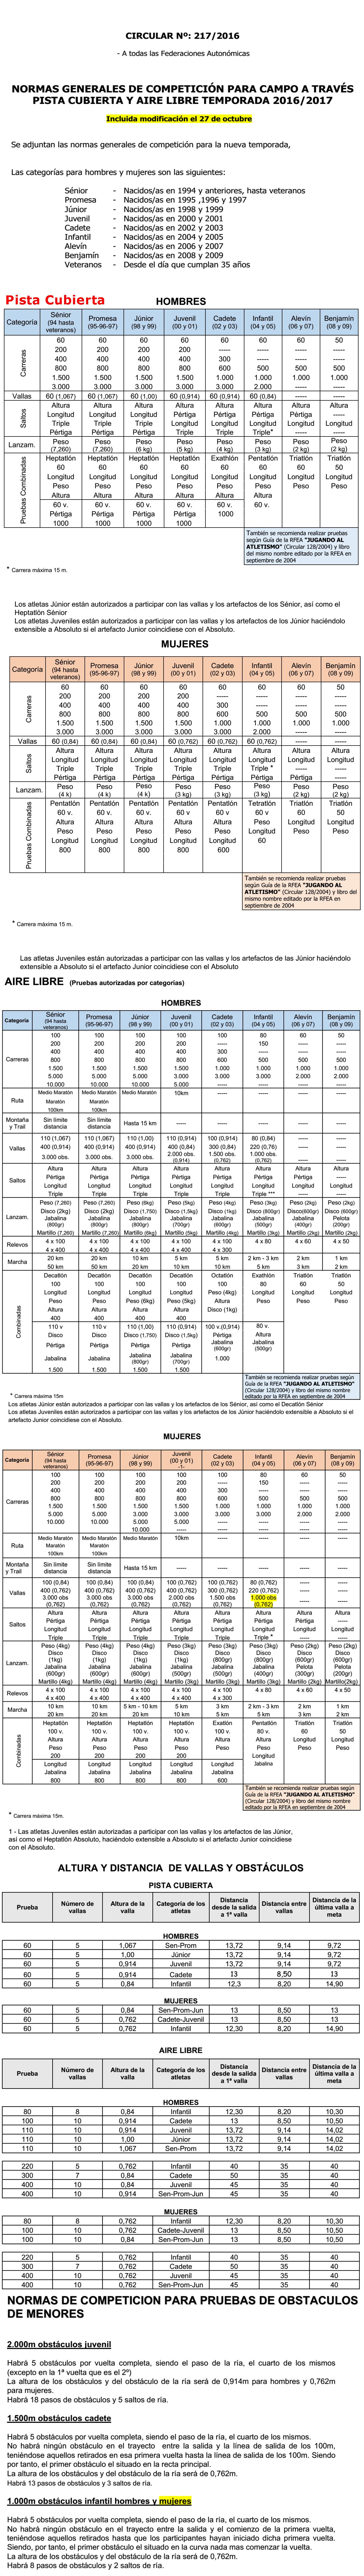 2016-normas-generales-rfea